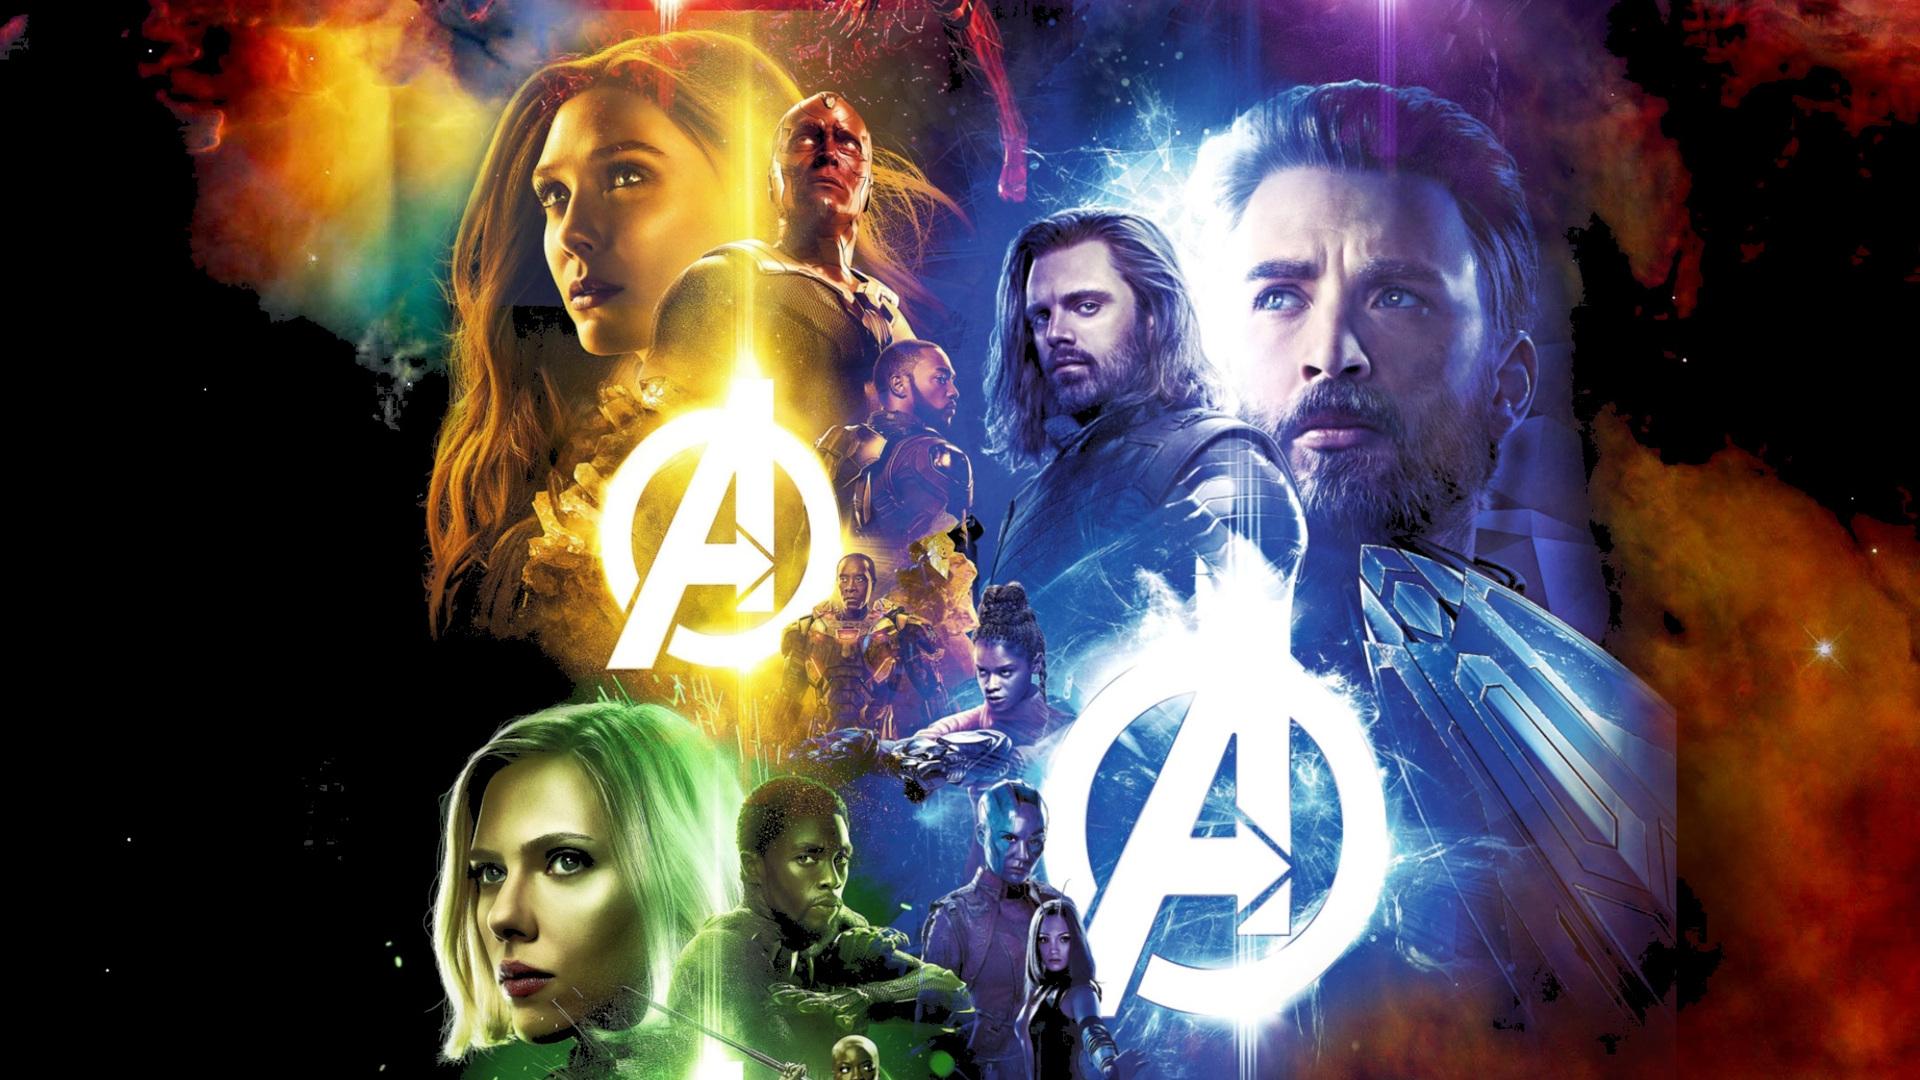 1920x1080 Avengers Infinity War Movie 2018 Laptop Full Hd 1080p Hd